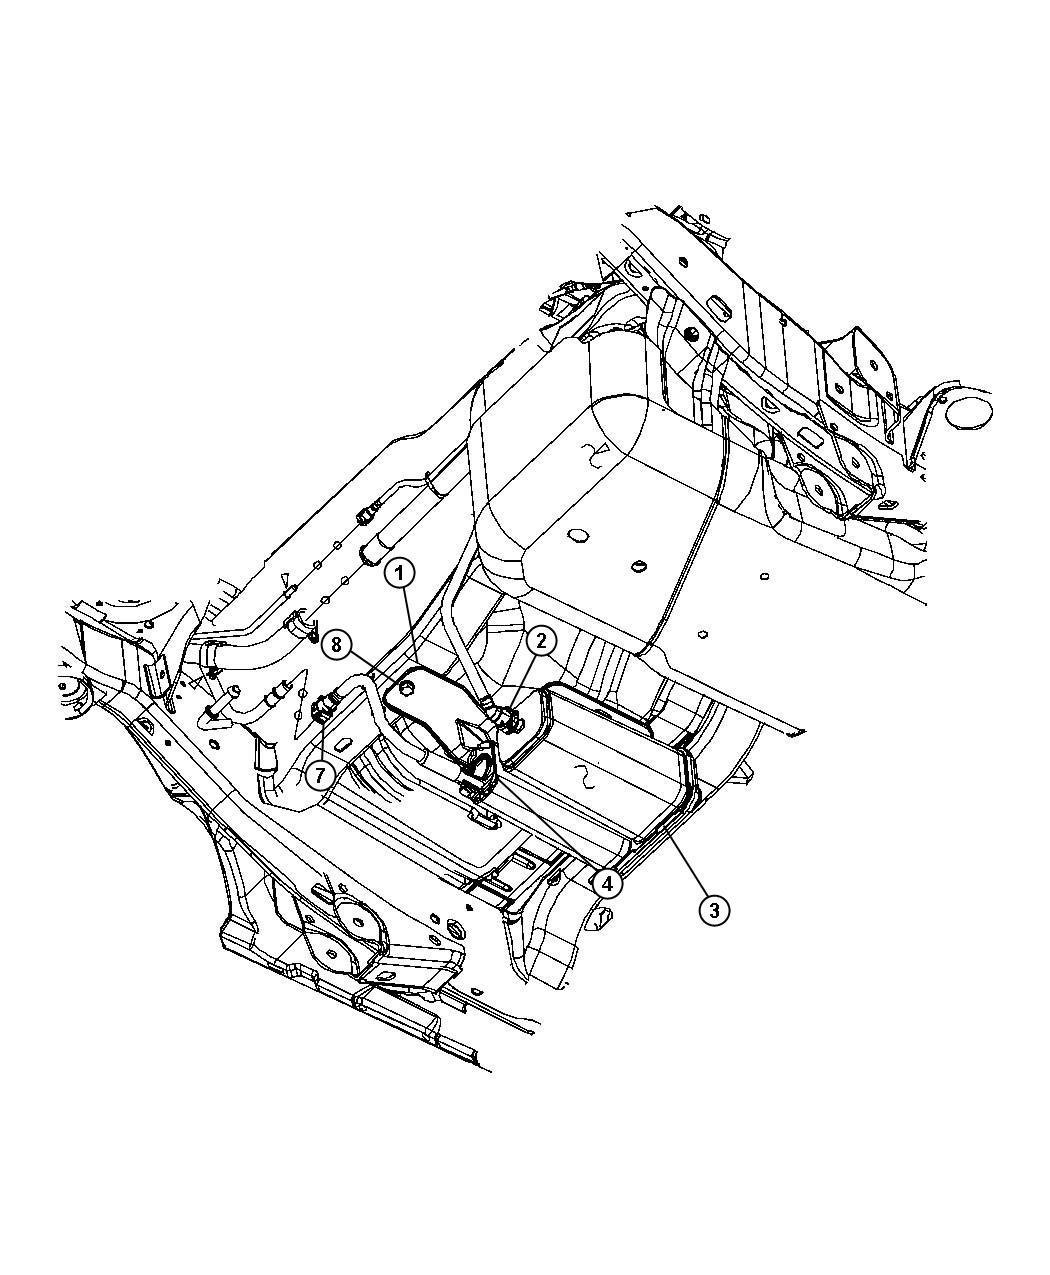 2007 Jeep Wrangler Bracket. Vapor canister. Export. Tank